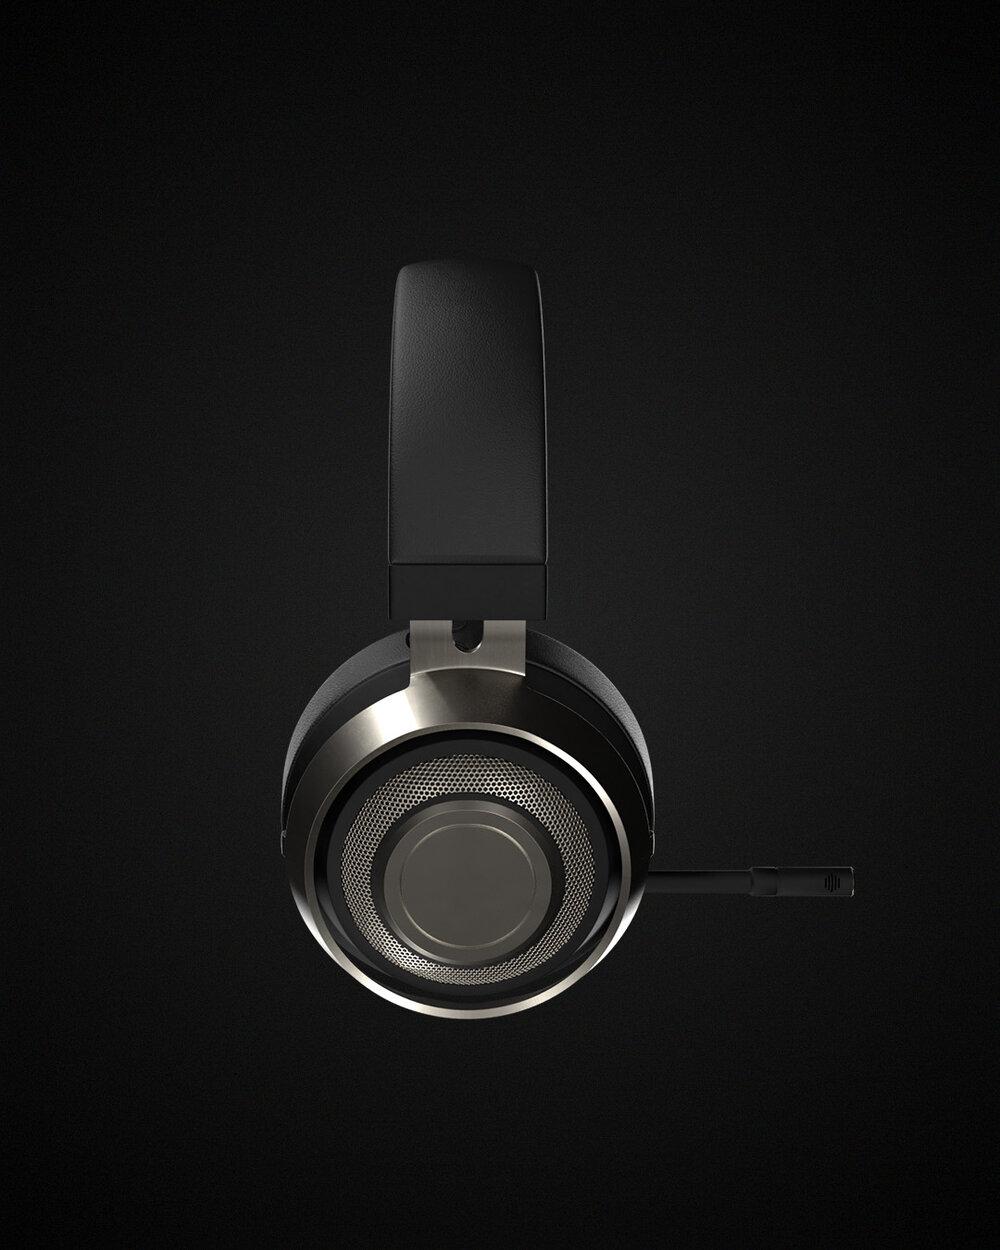 Headset_ProfileView.jpg